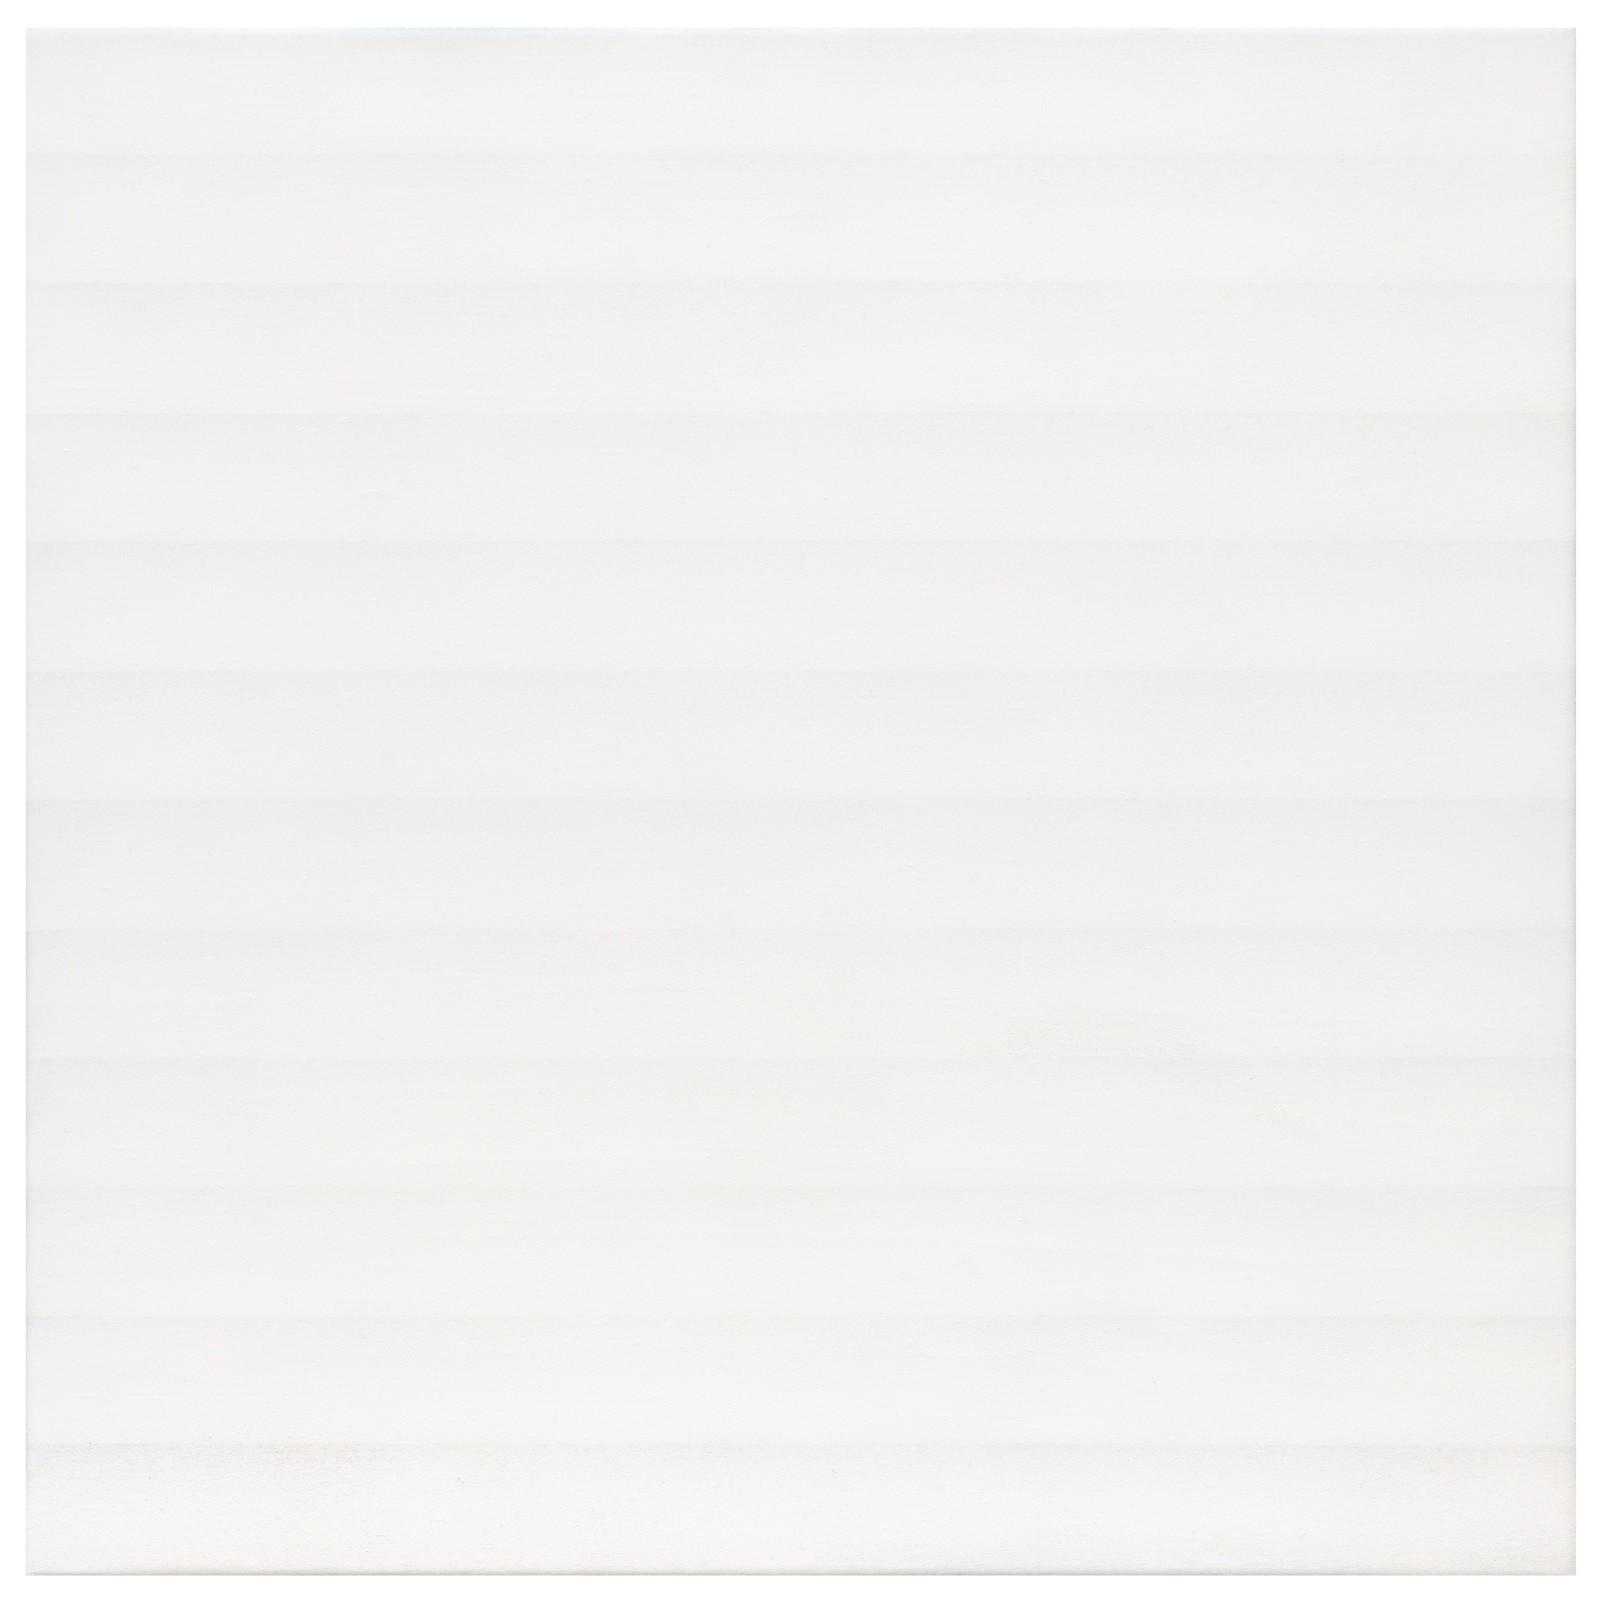 "<span class=""link fancybox-details-link""><a href=""/exhibitions/554/works/artworks_standalone9846/"">View Detail Page</a></span><div class=""artist""><span class=""artist""><strong>RAIMUND GIRKE</strong></span></div><div class=""title""><em>Lamellenbild</em>, 1967</div><div class=""medium"">Tempera on canvas</div><div class=""dimensions"">60 x 60 cm<br />23 ⅝ x 23 ⅝ inches</div>"